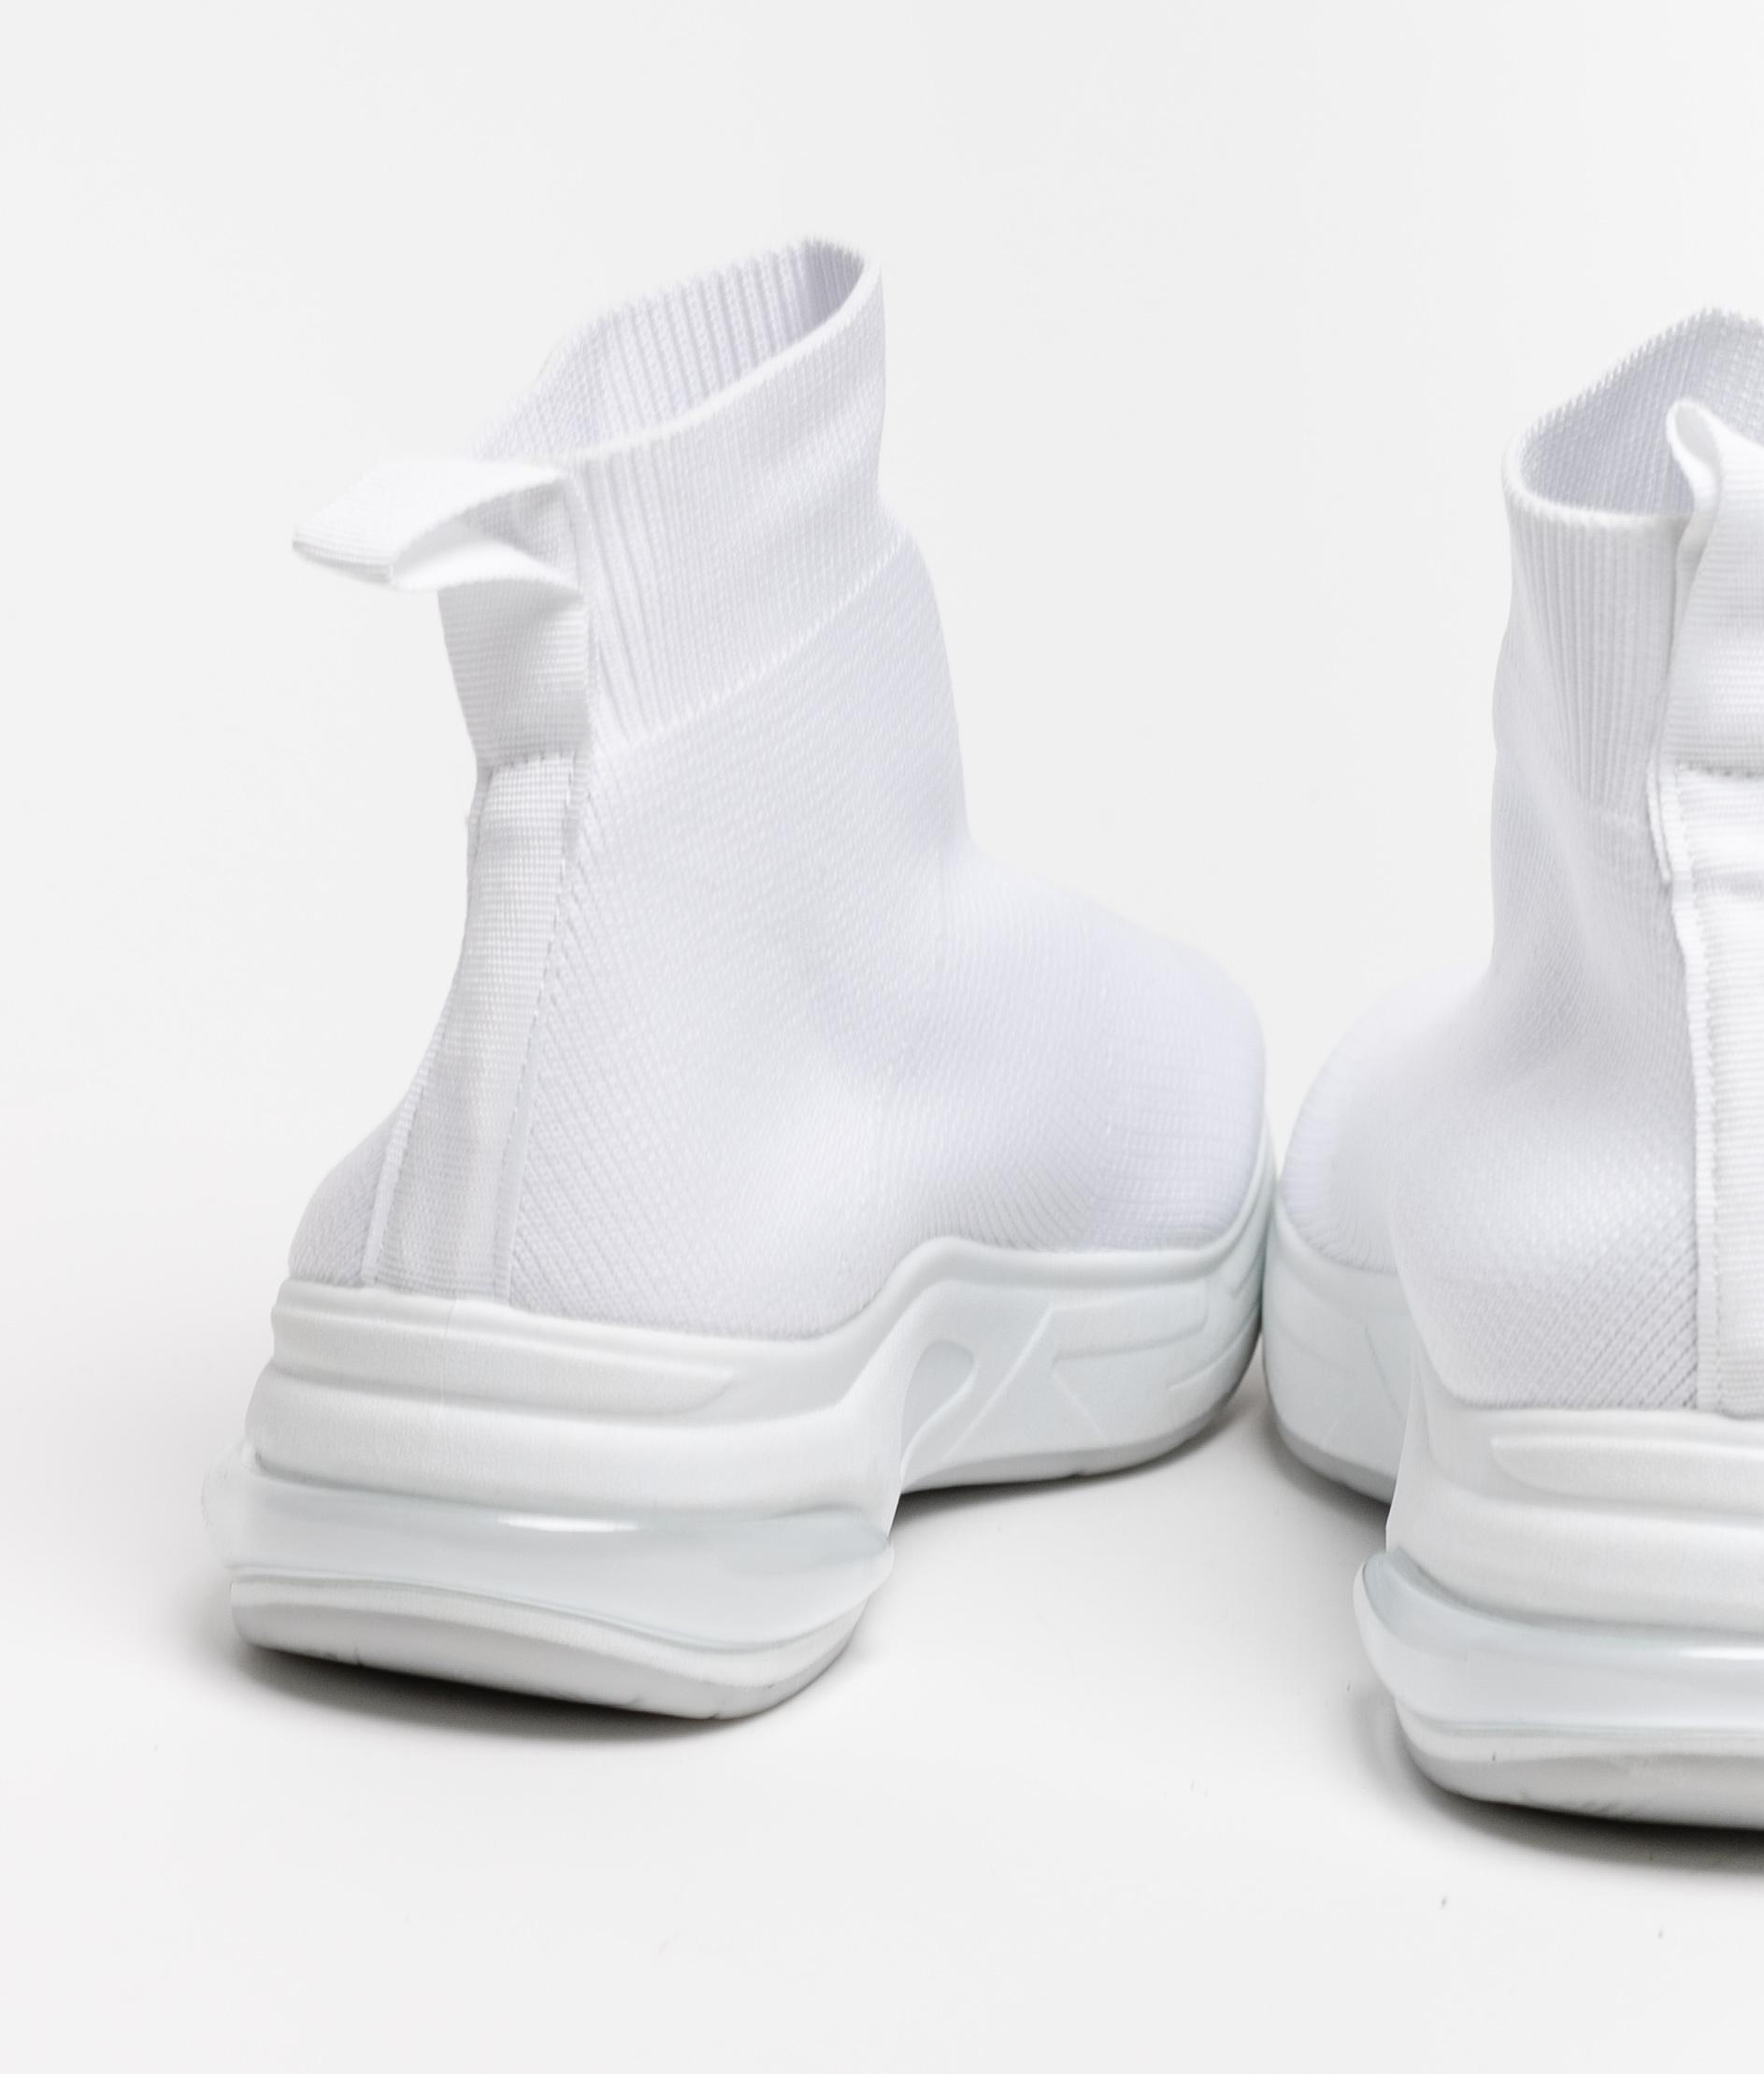 Sneakers Molia - Branco